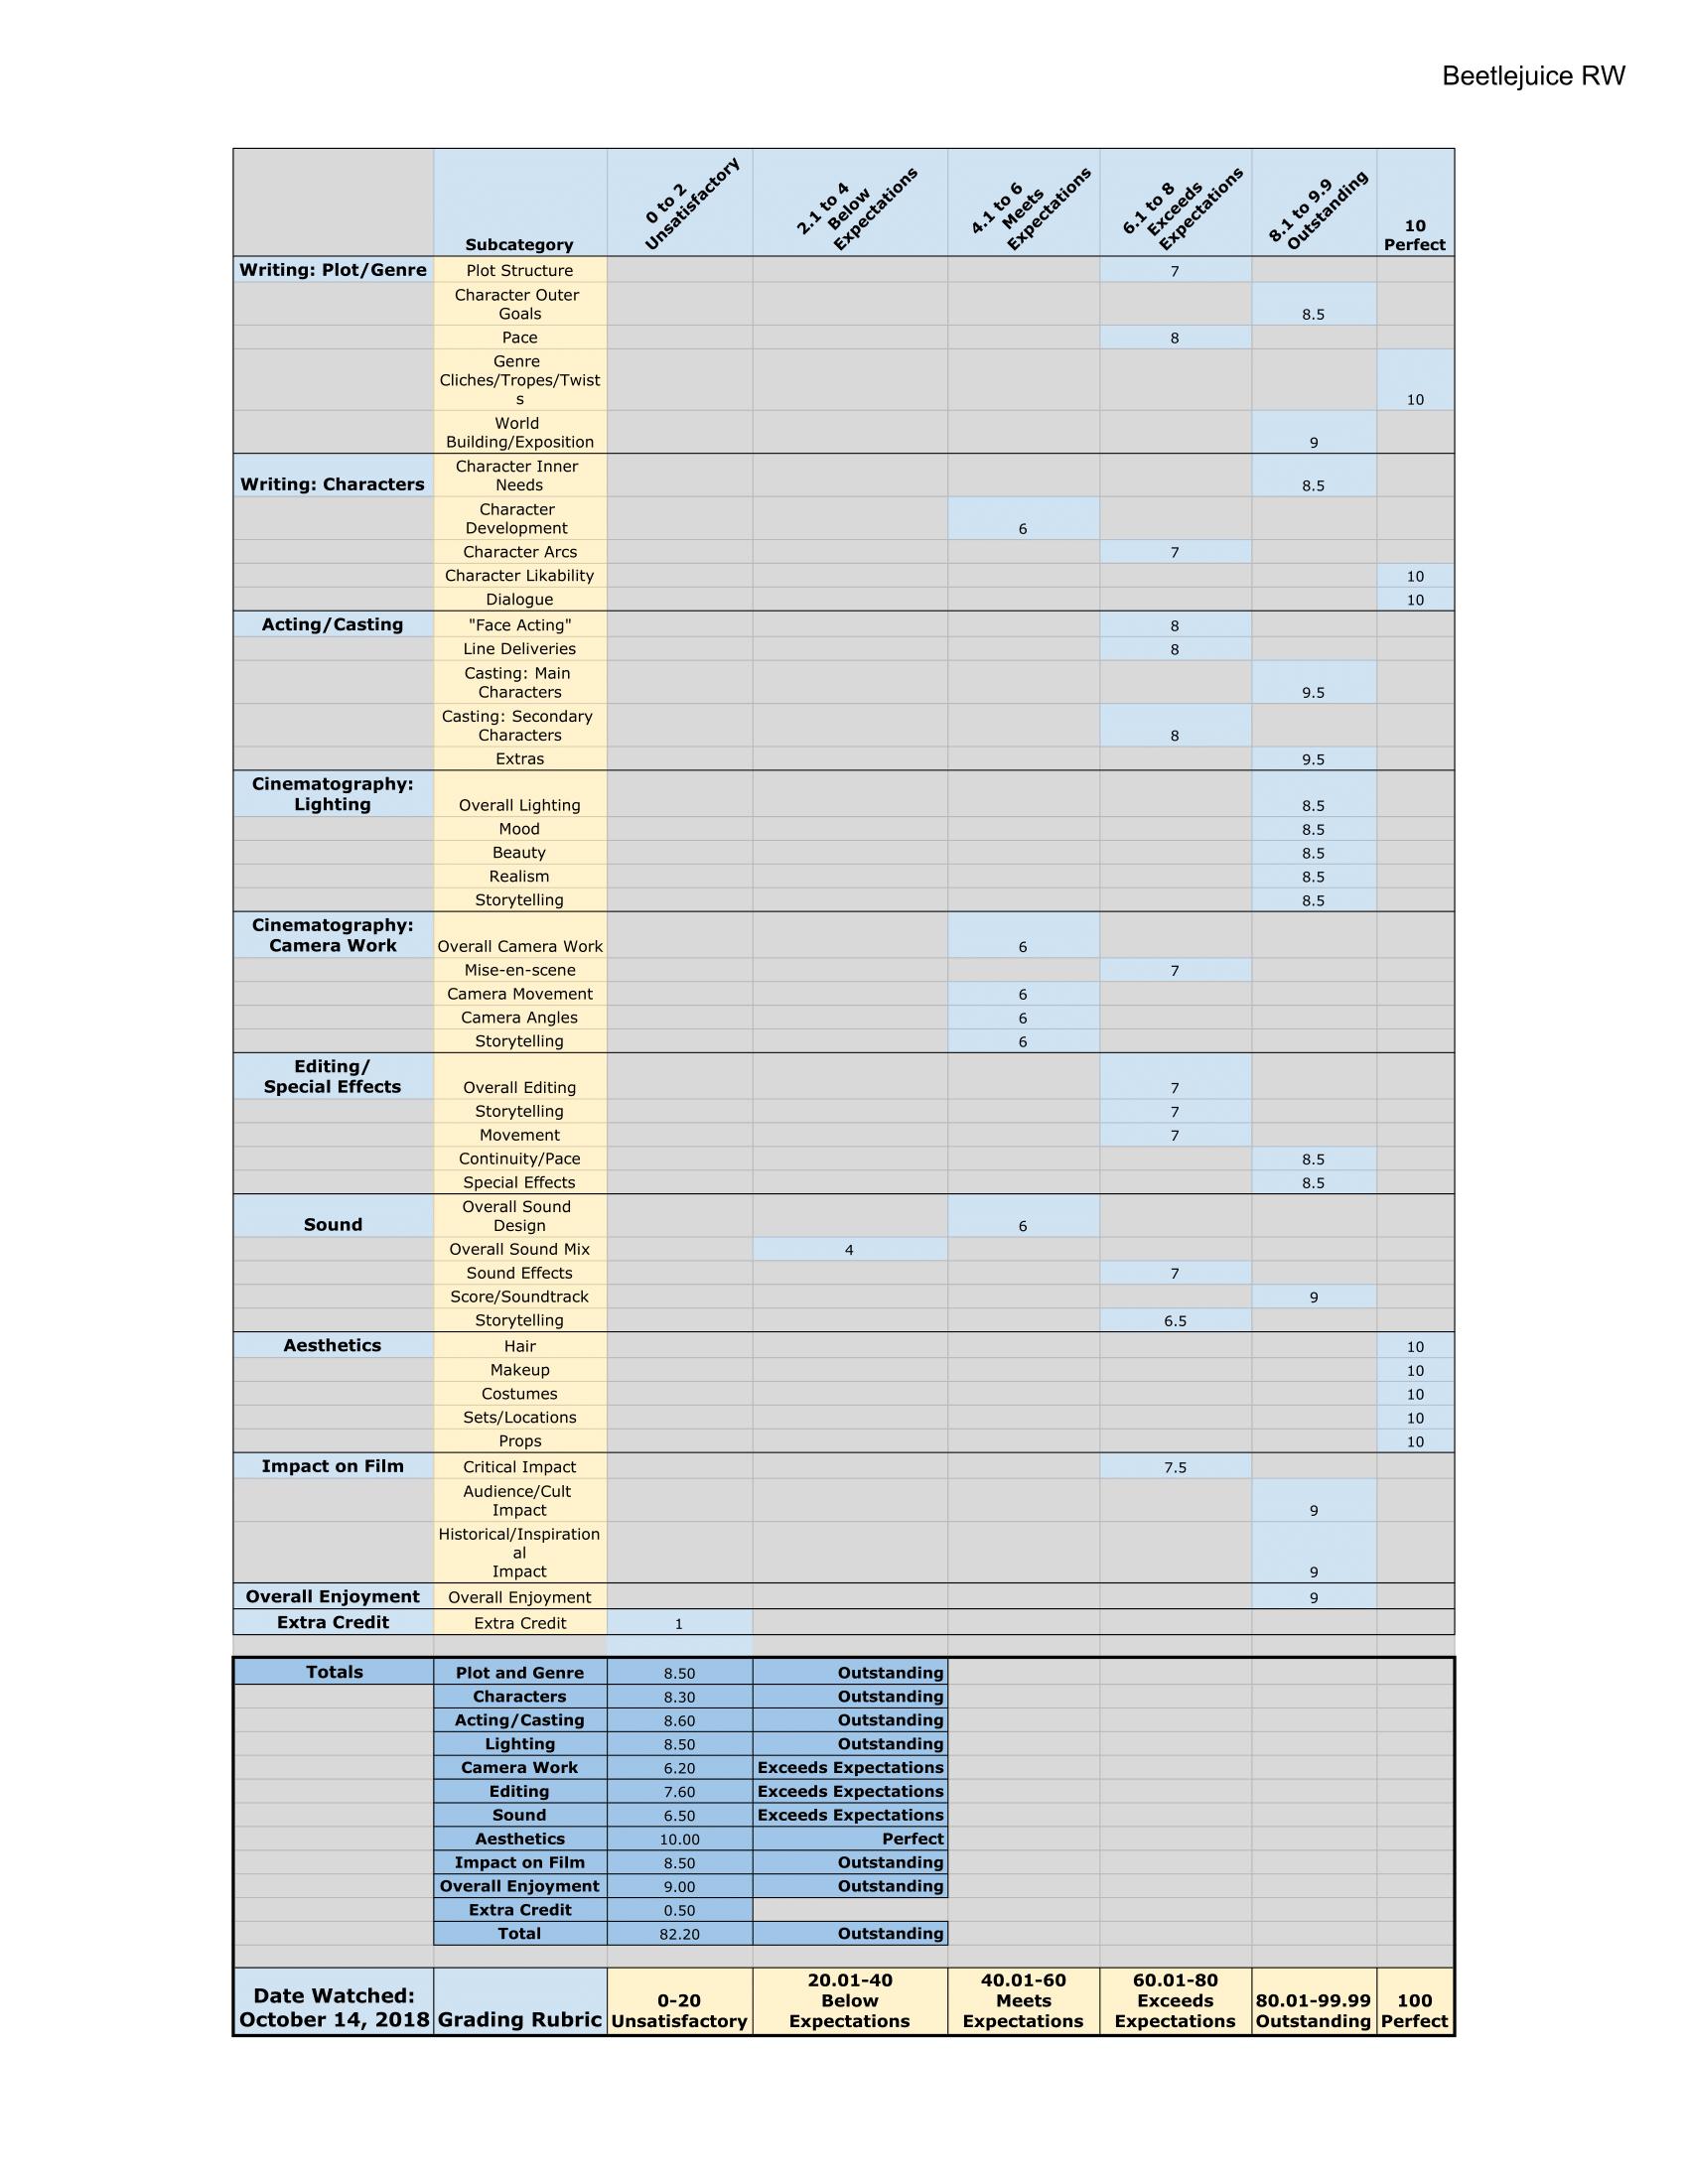 Untitled spreadsheet - Beetlejuice RW-1.png